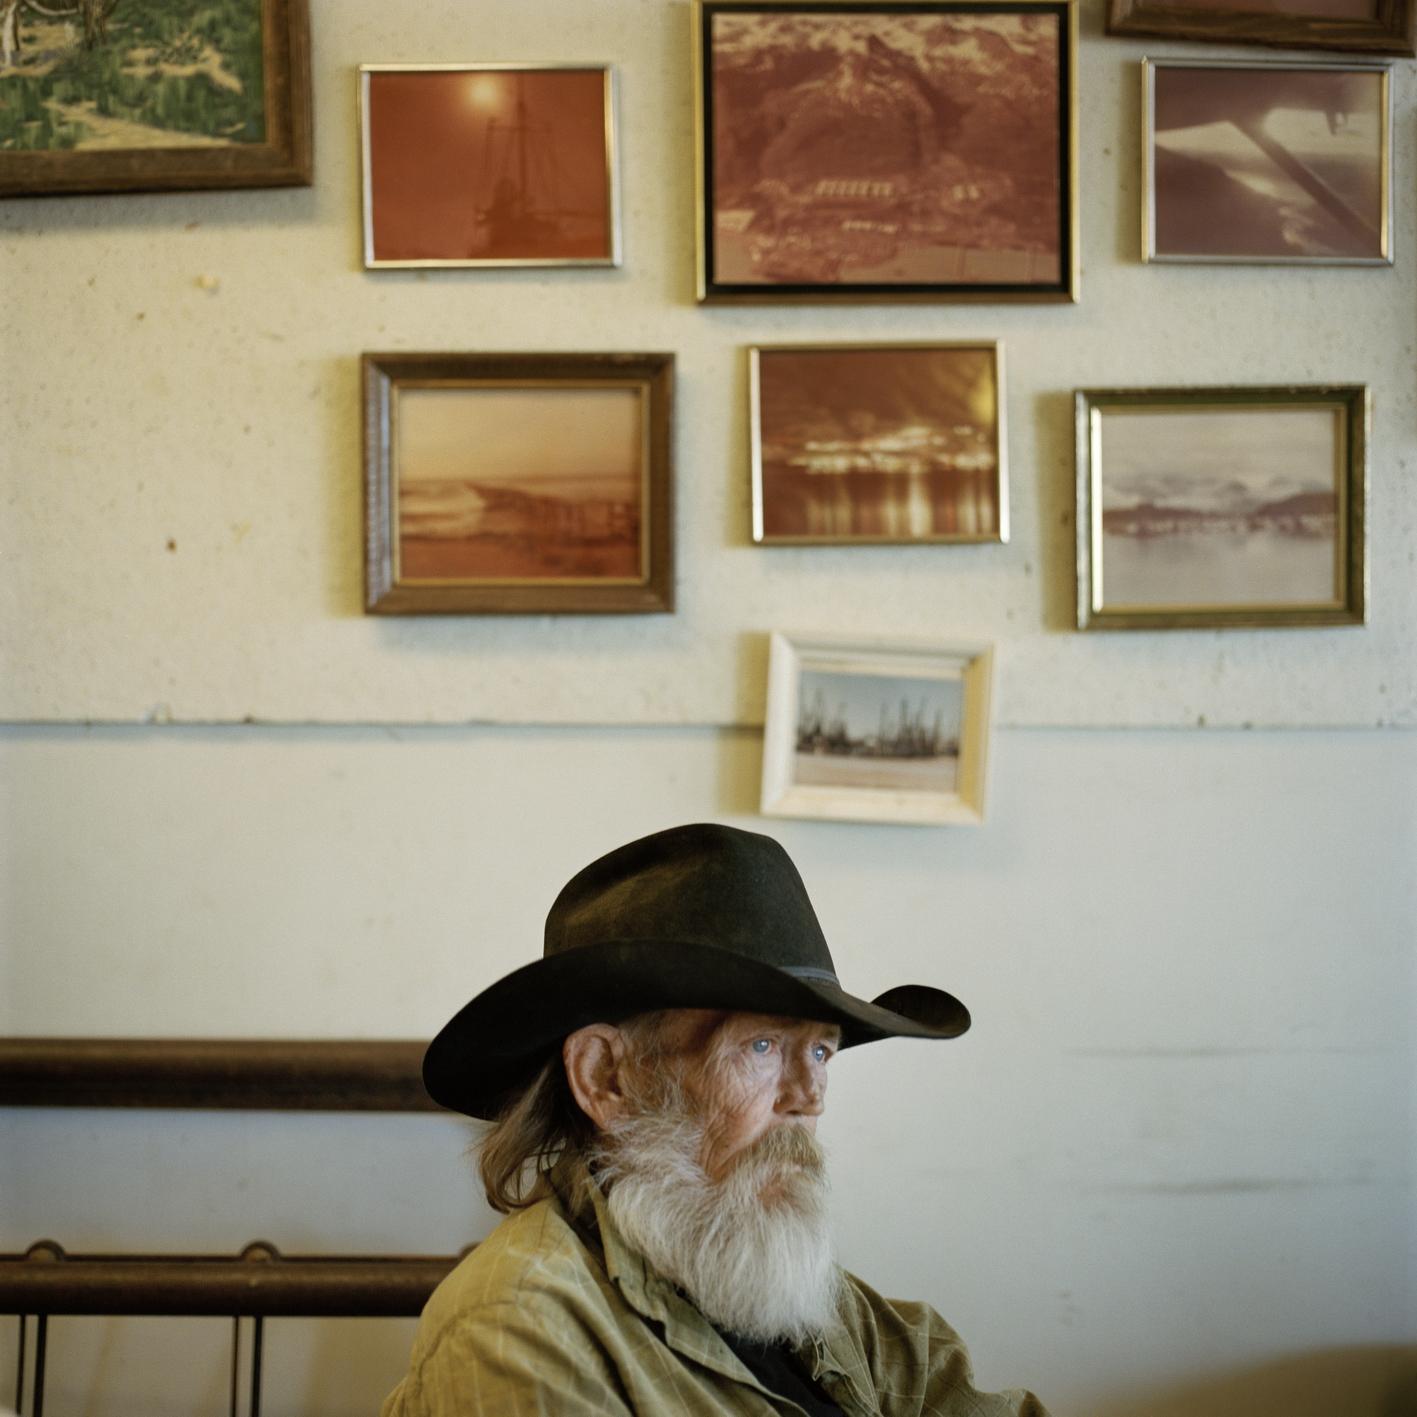 05_Chris Collins - Texas 2012®RonanGuillou